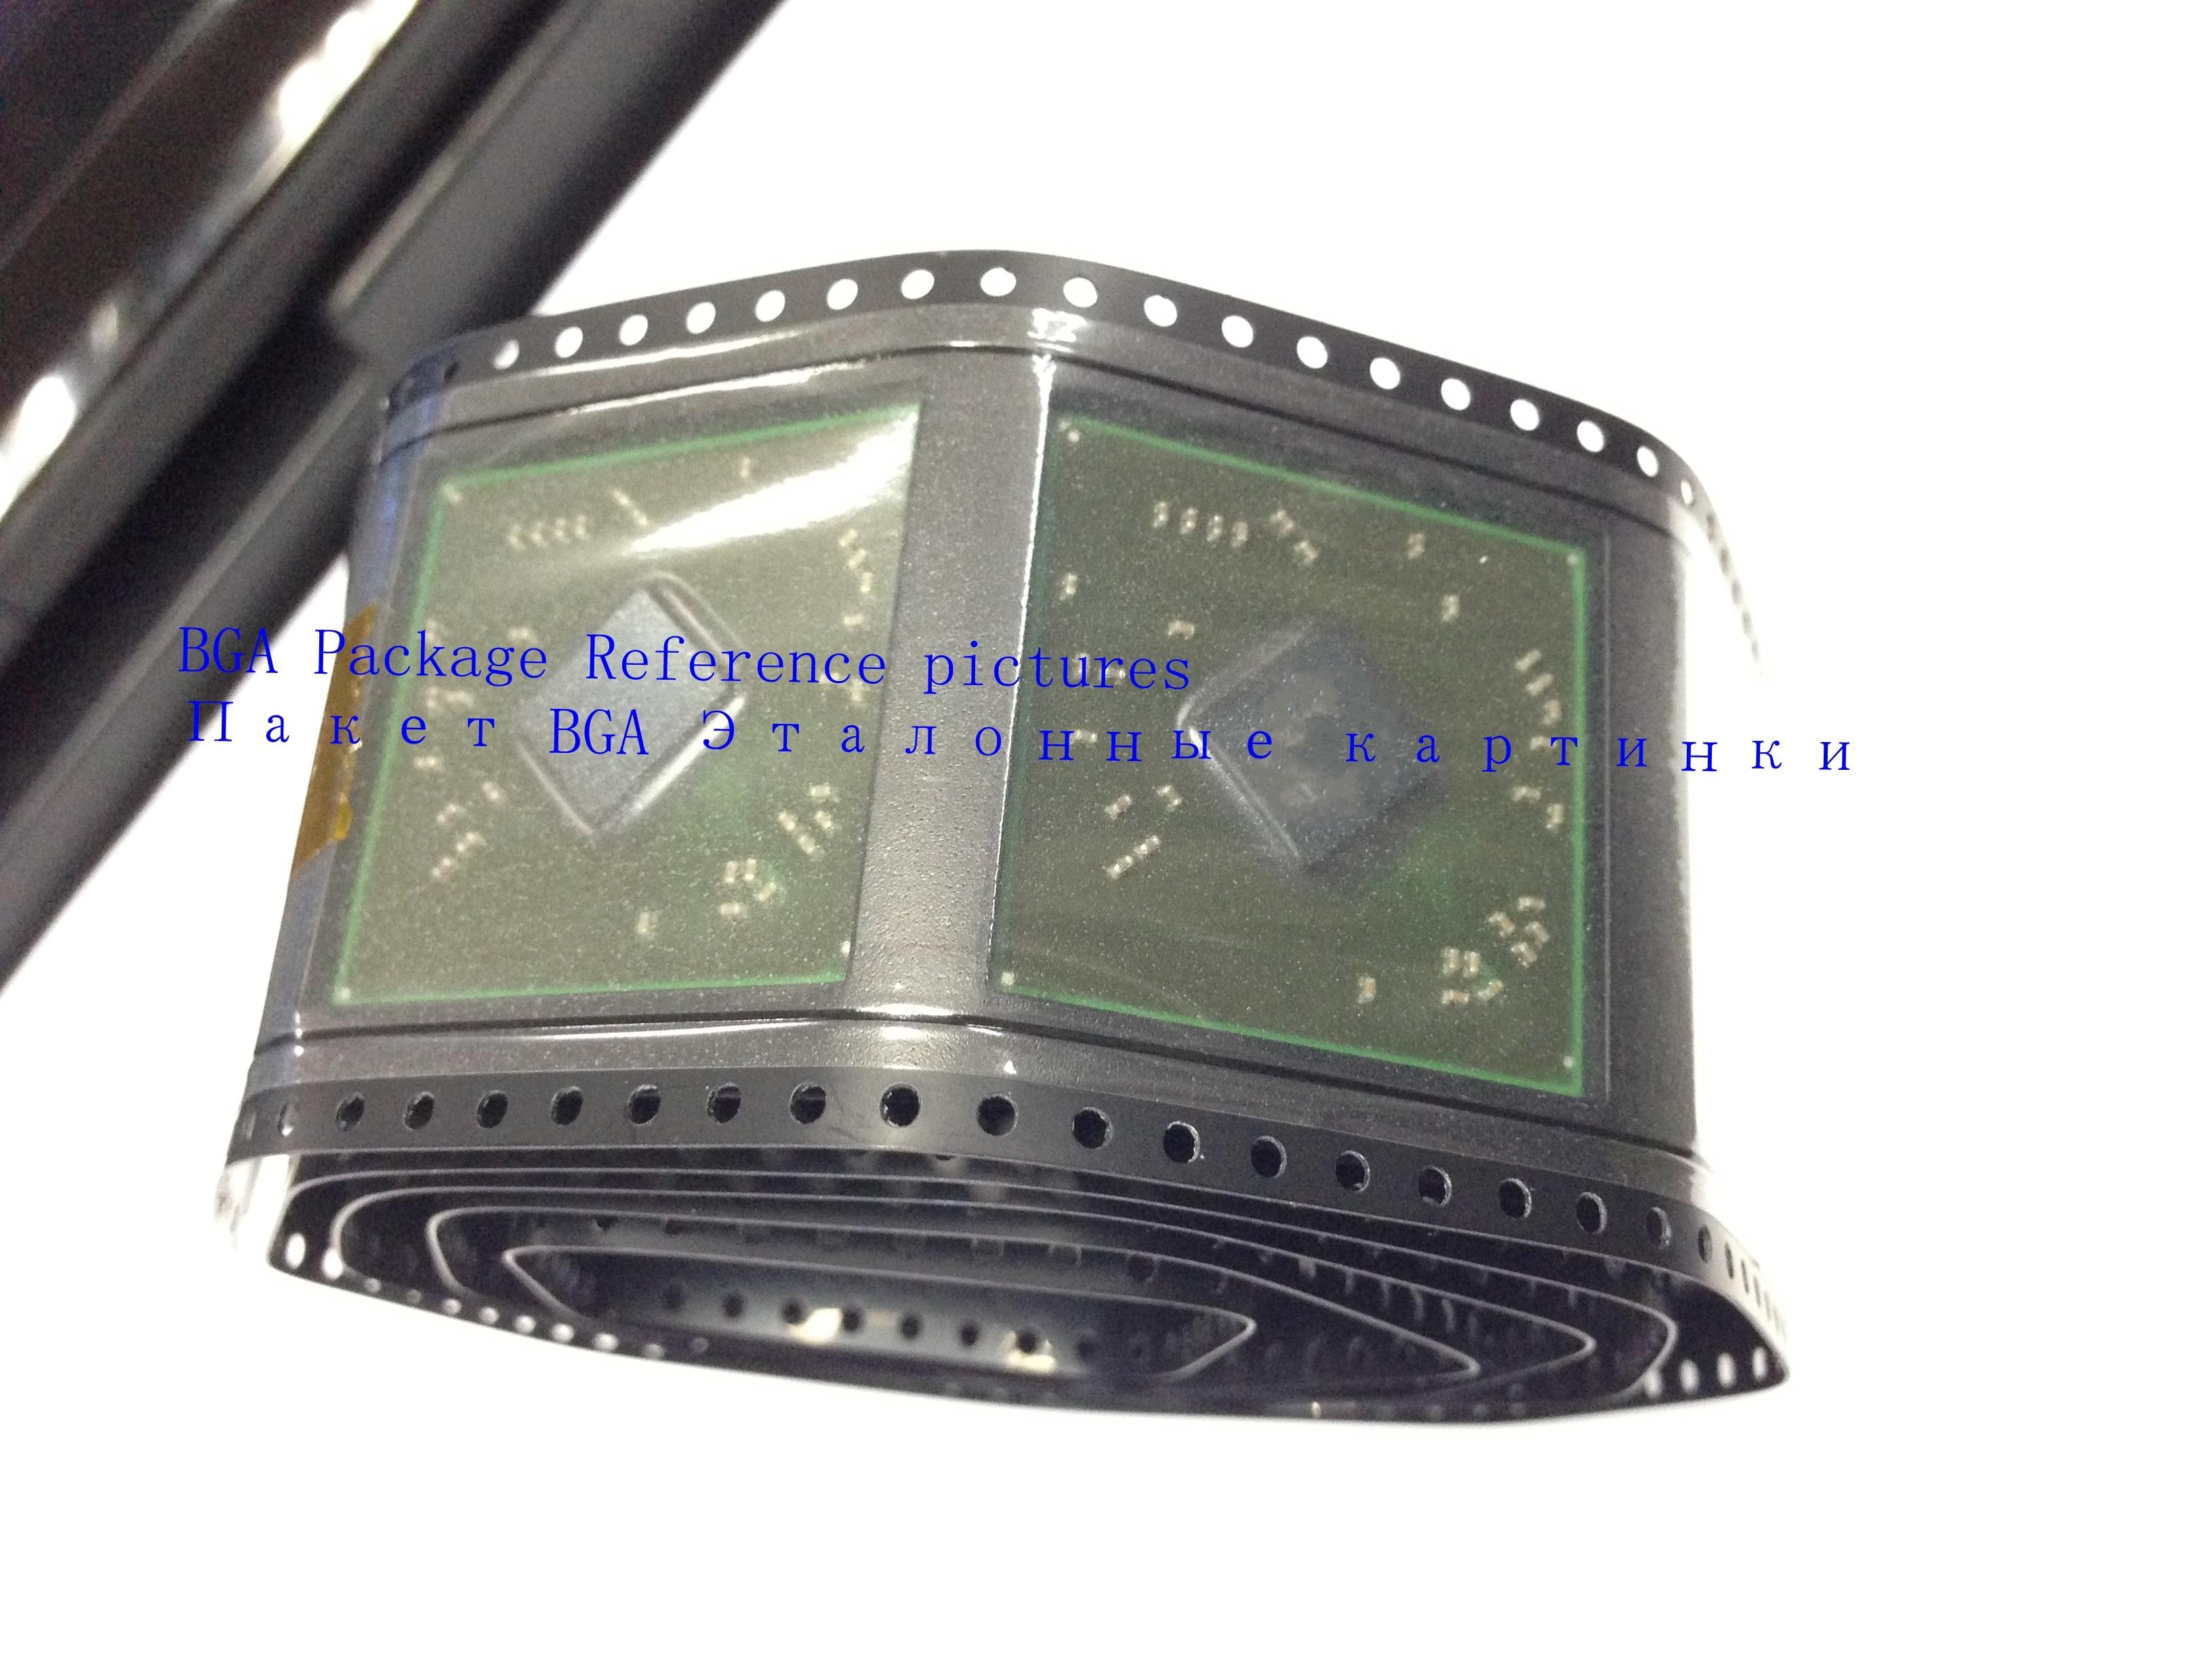 1pcs/lot 100% New 216-0728009 216 0728009 BGA Chipset1pcs/lot 100% New 216-0728009 216 0728009 BGA Chipset